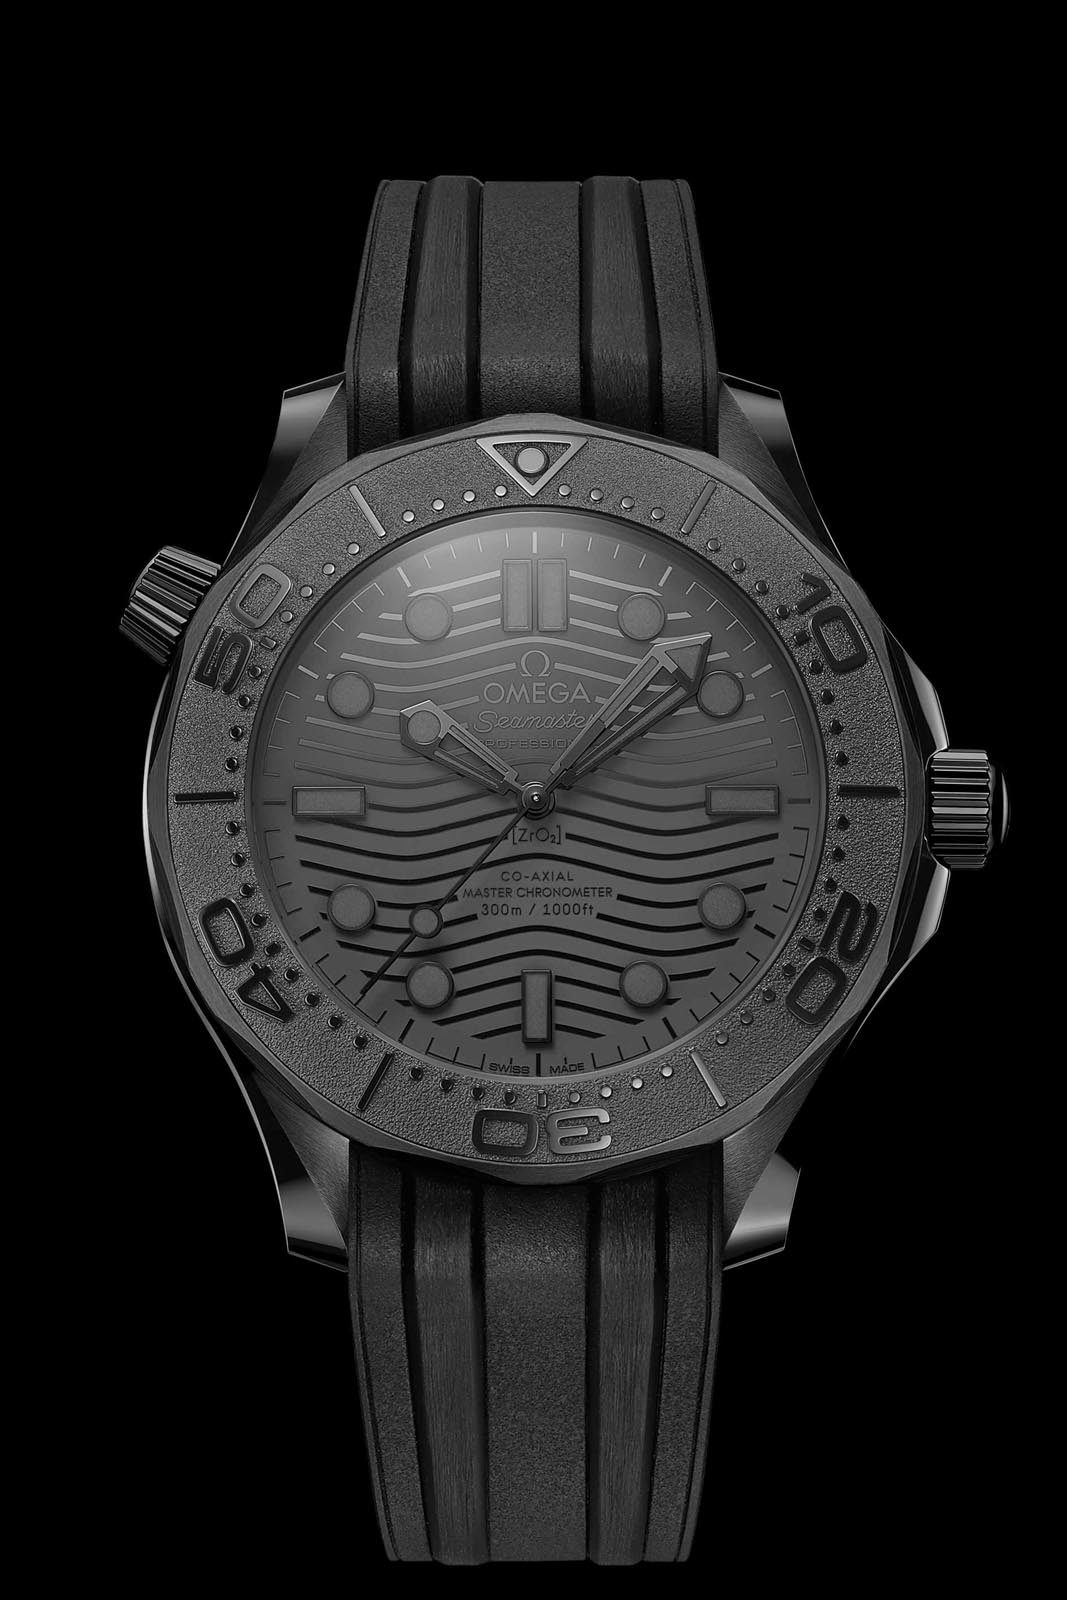 Watches_Wonder OMEGA_SeamasterDiver_BlackBlack